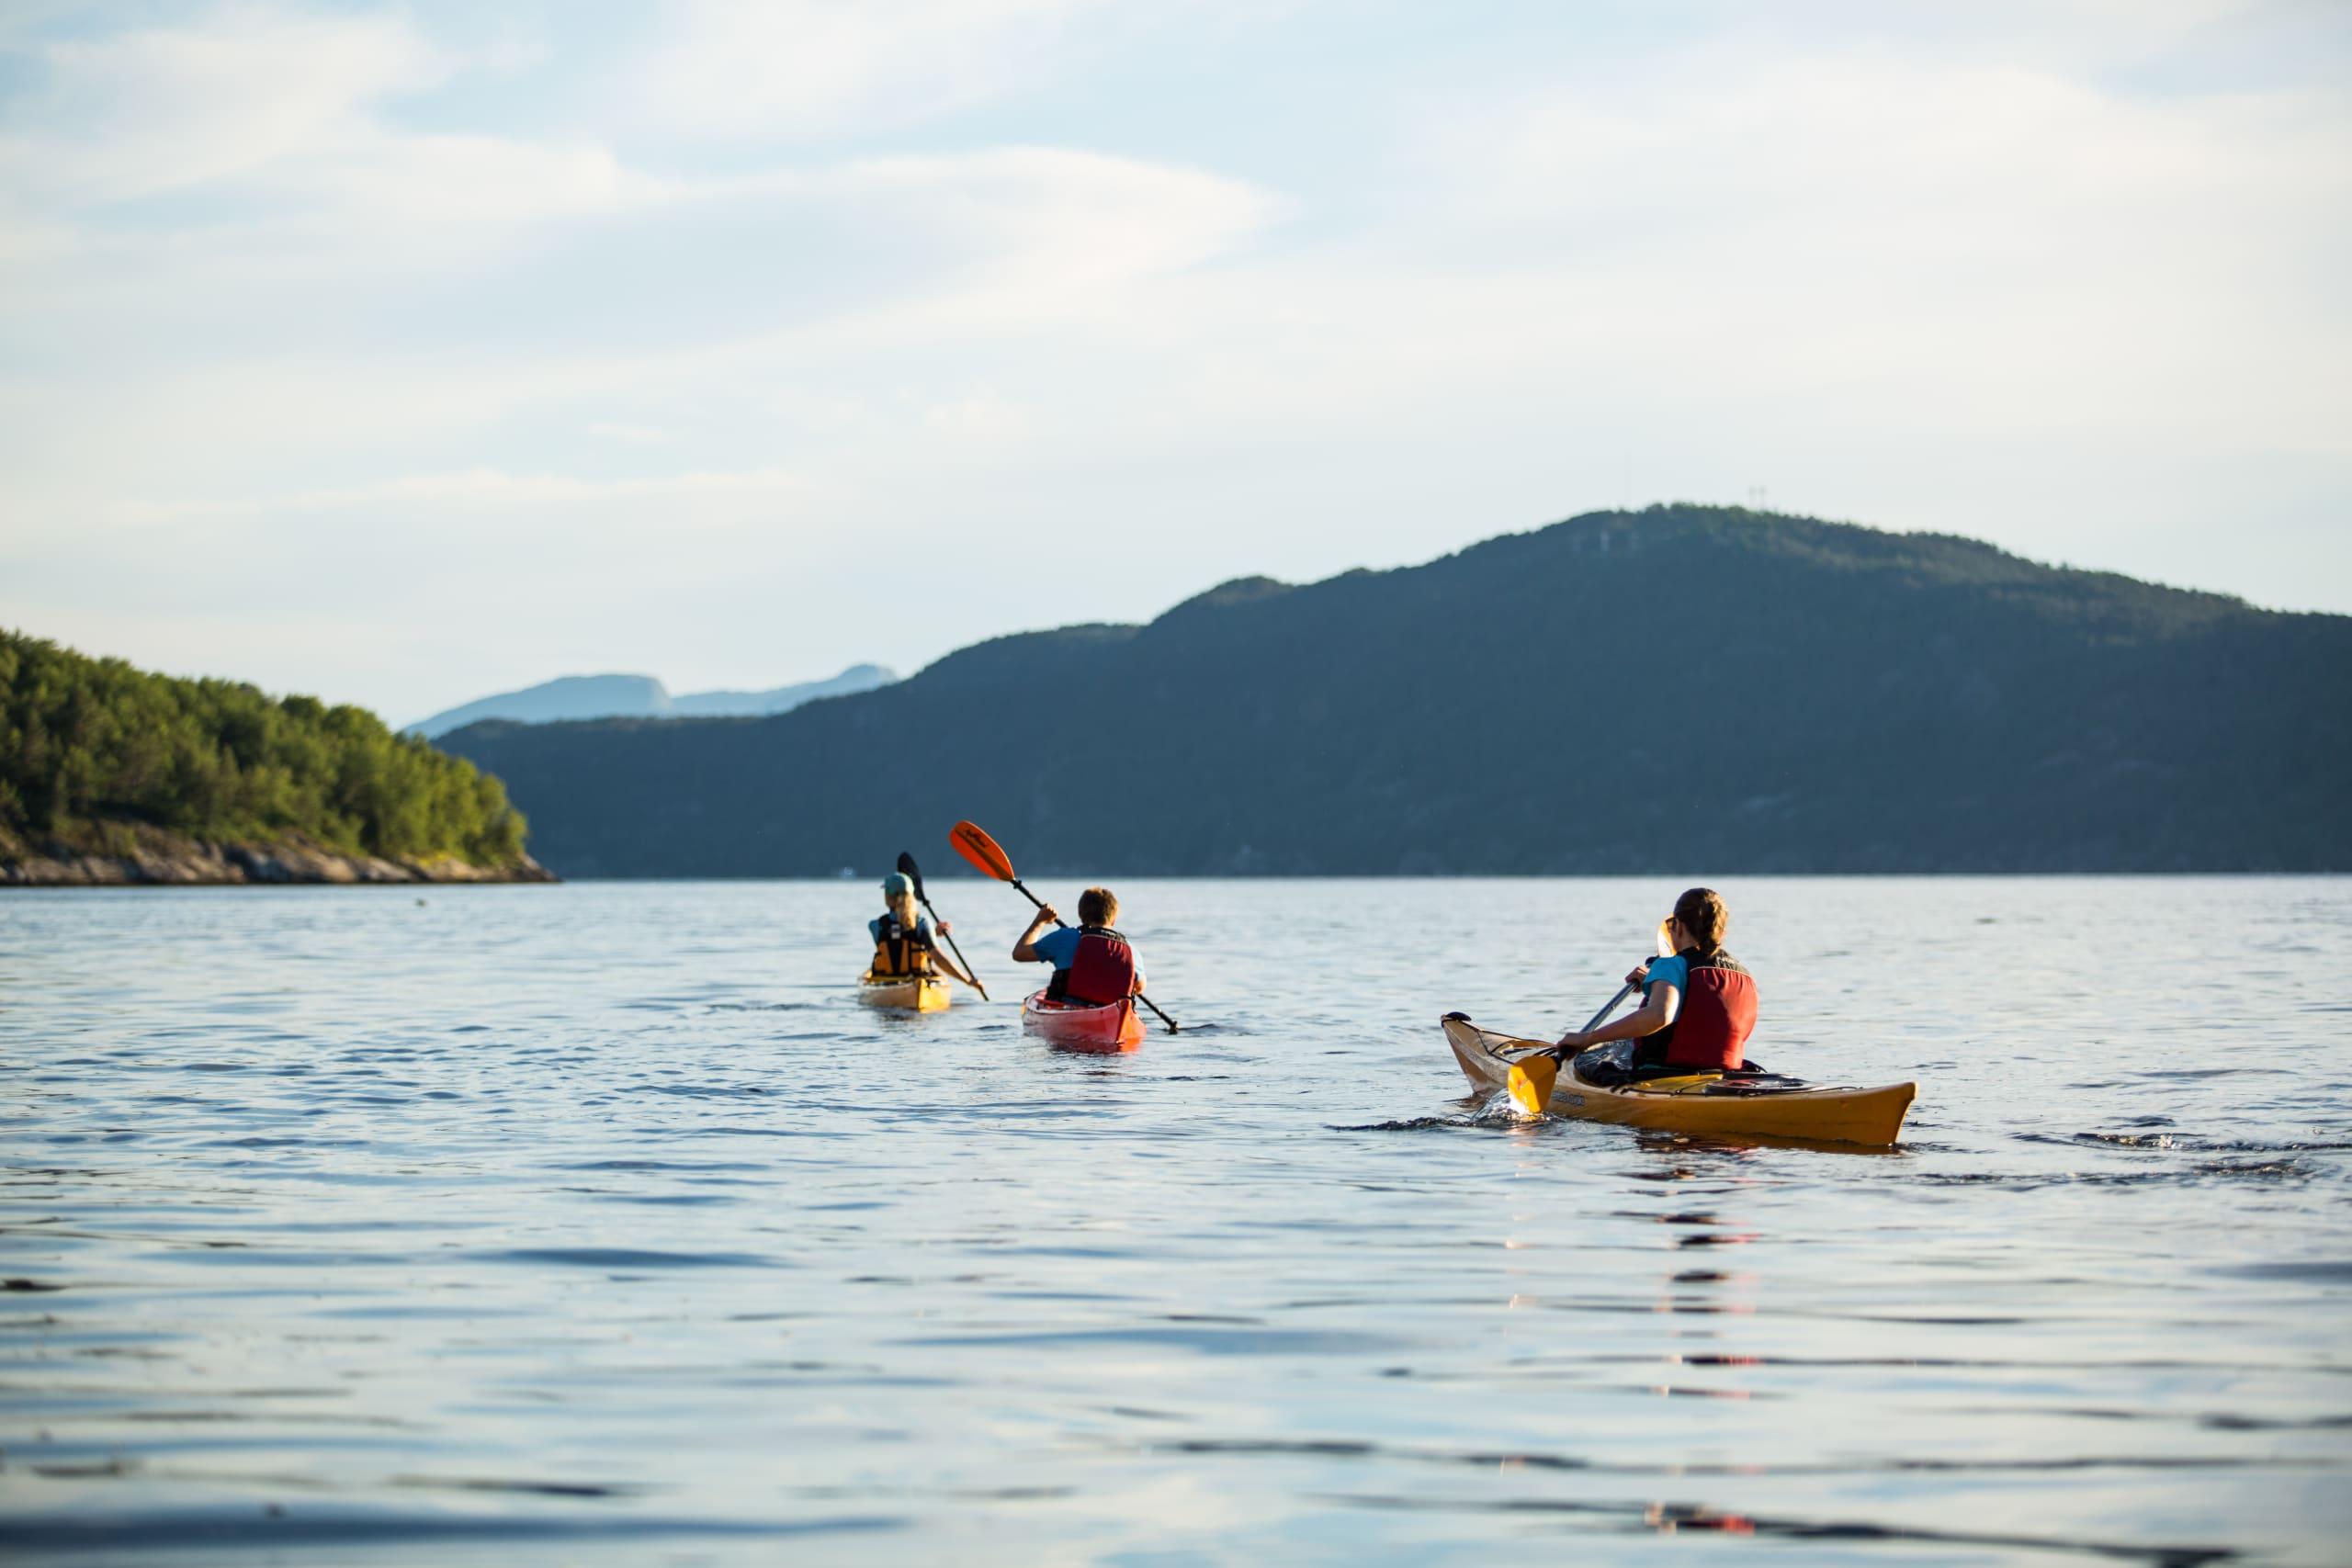 Kayaking on the Hardangerfjord starting from Jondal